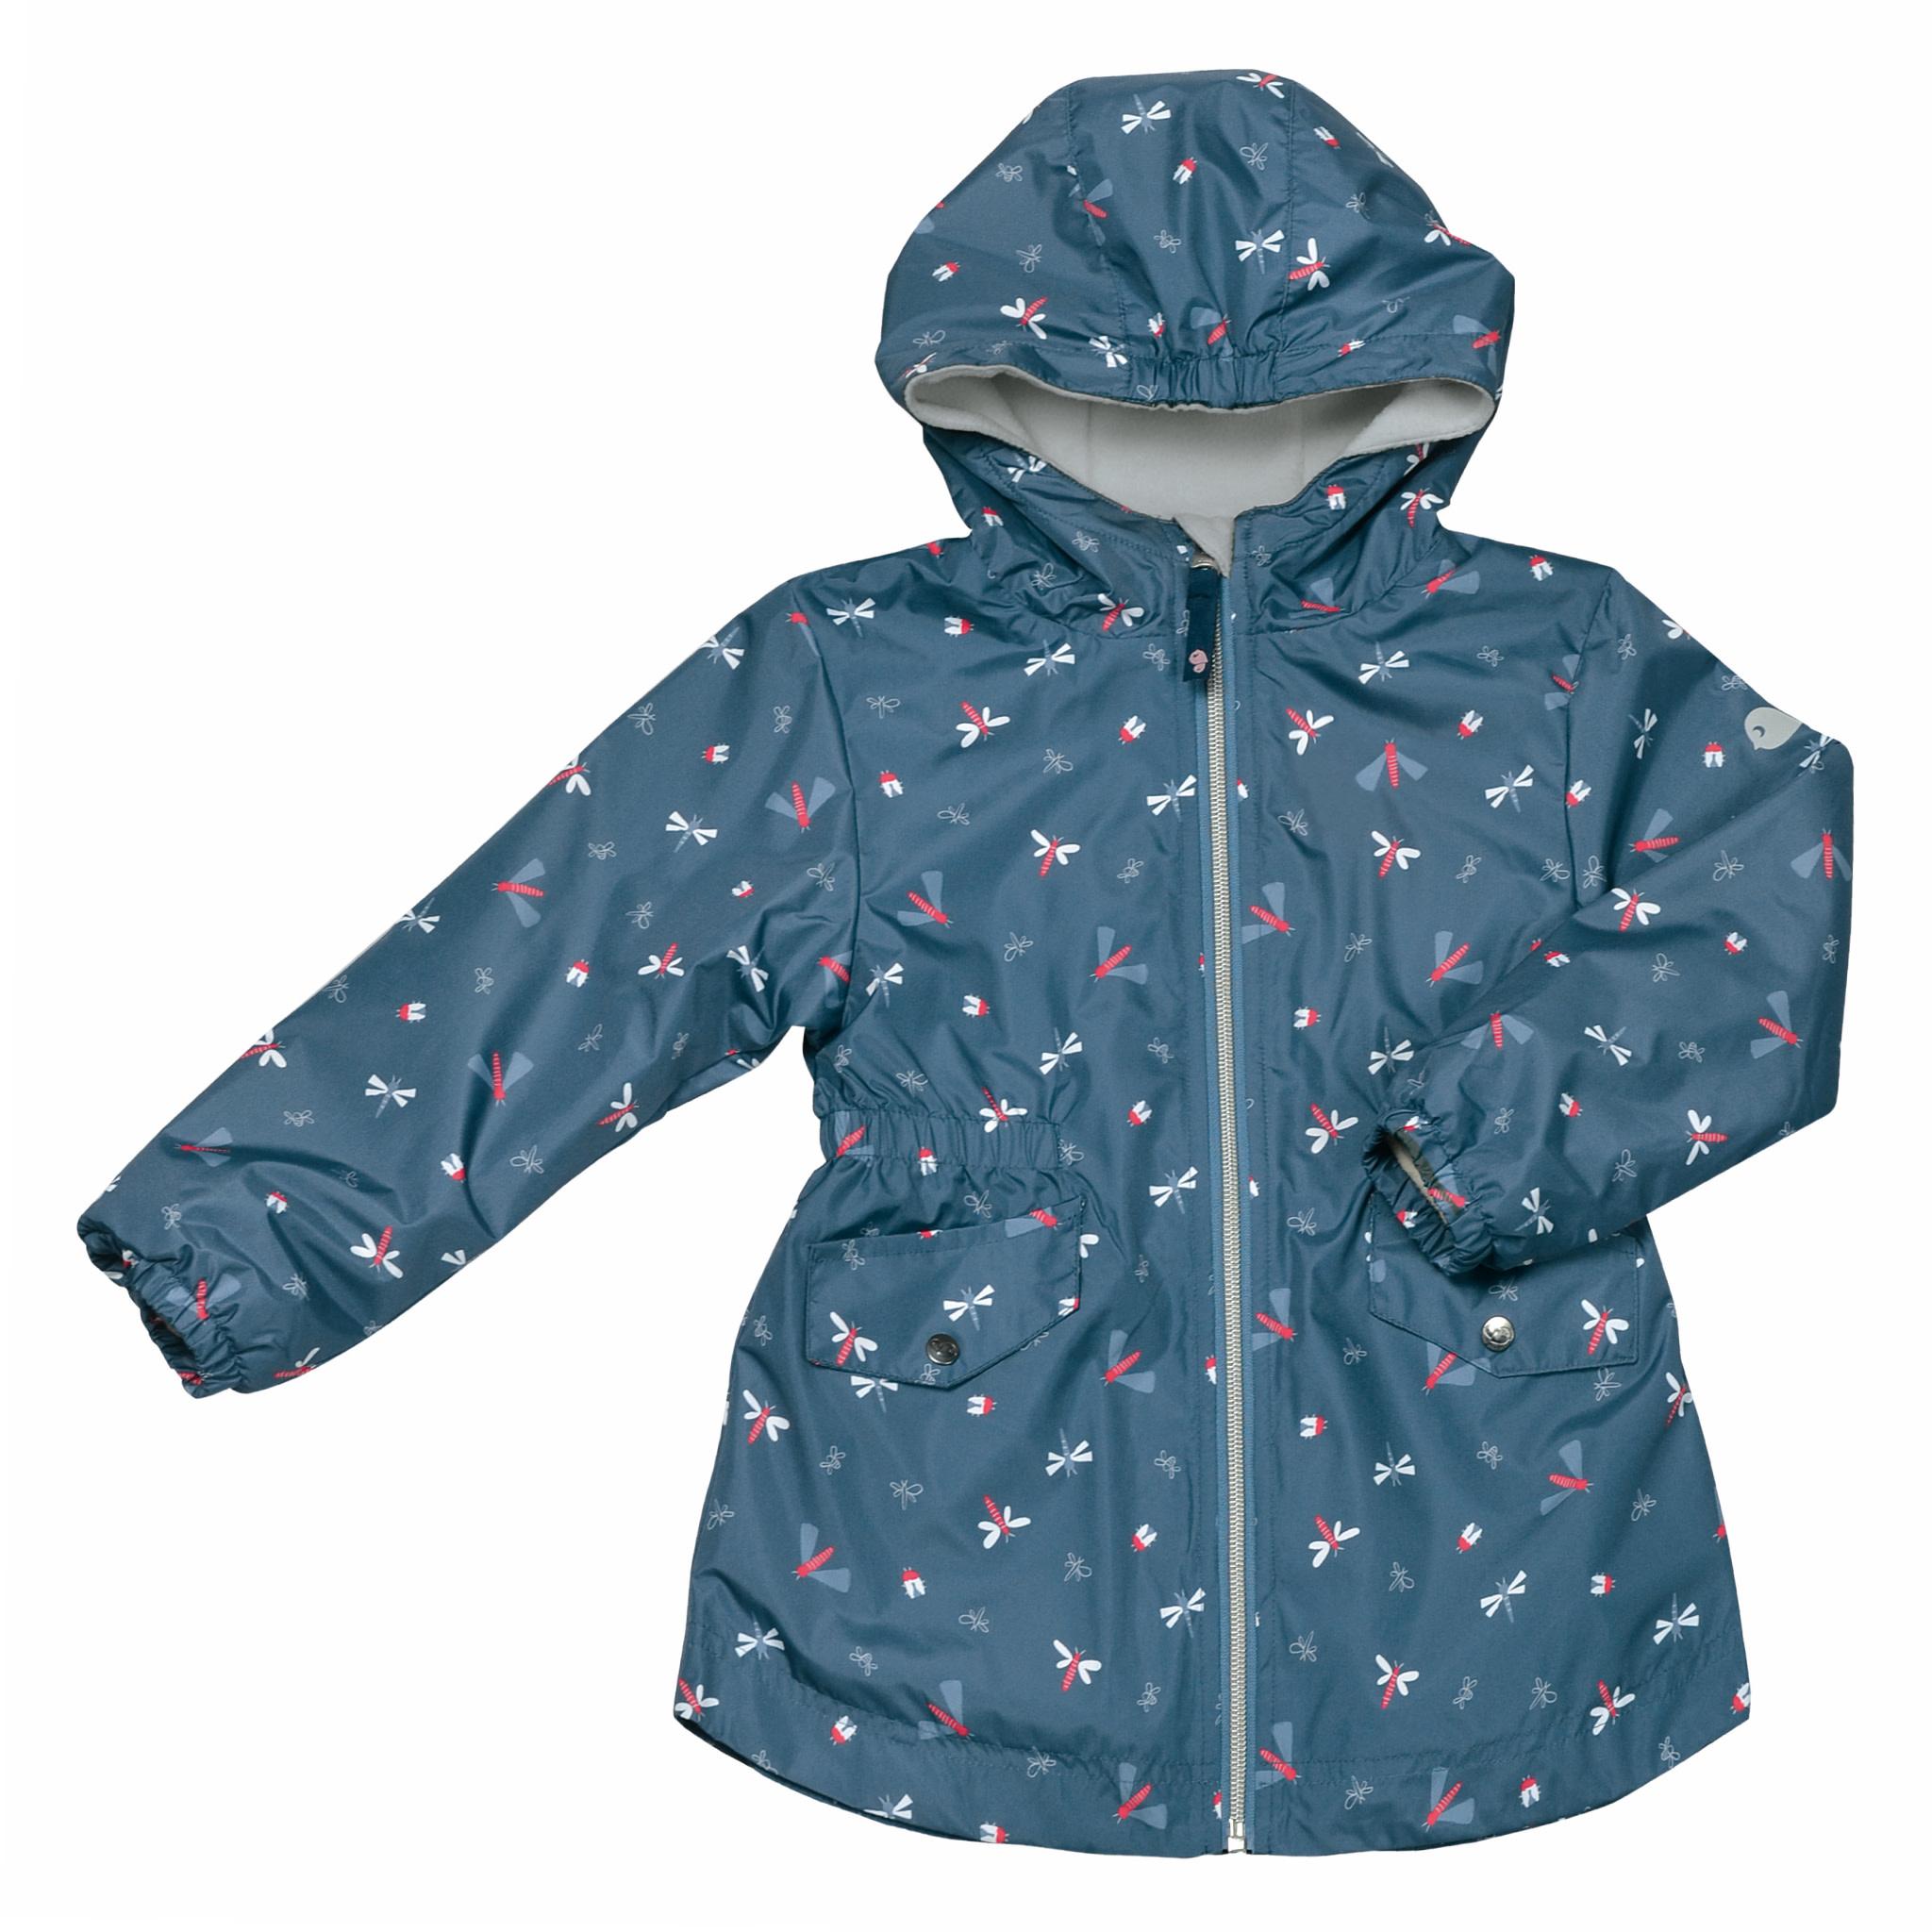 Manteau mi-saison - Libellules  Bleu-2